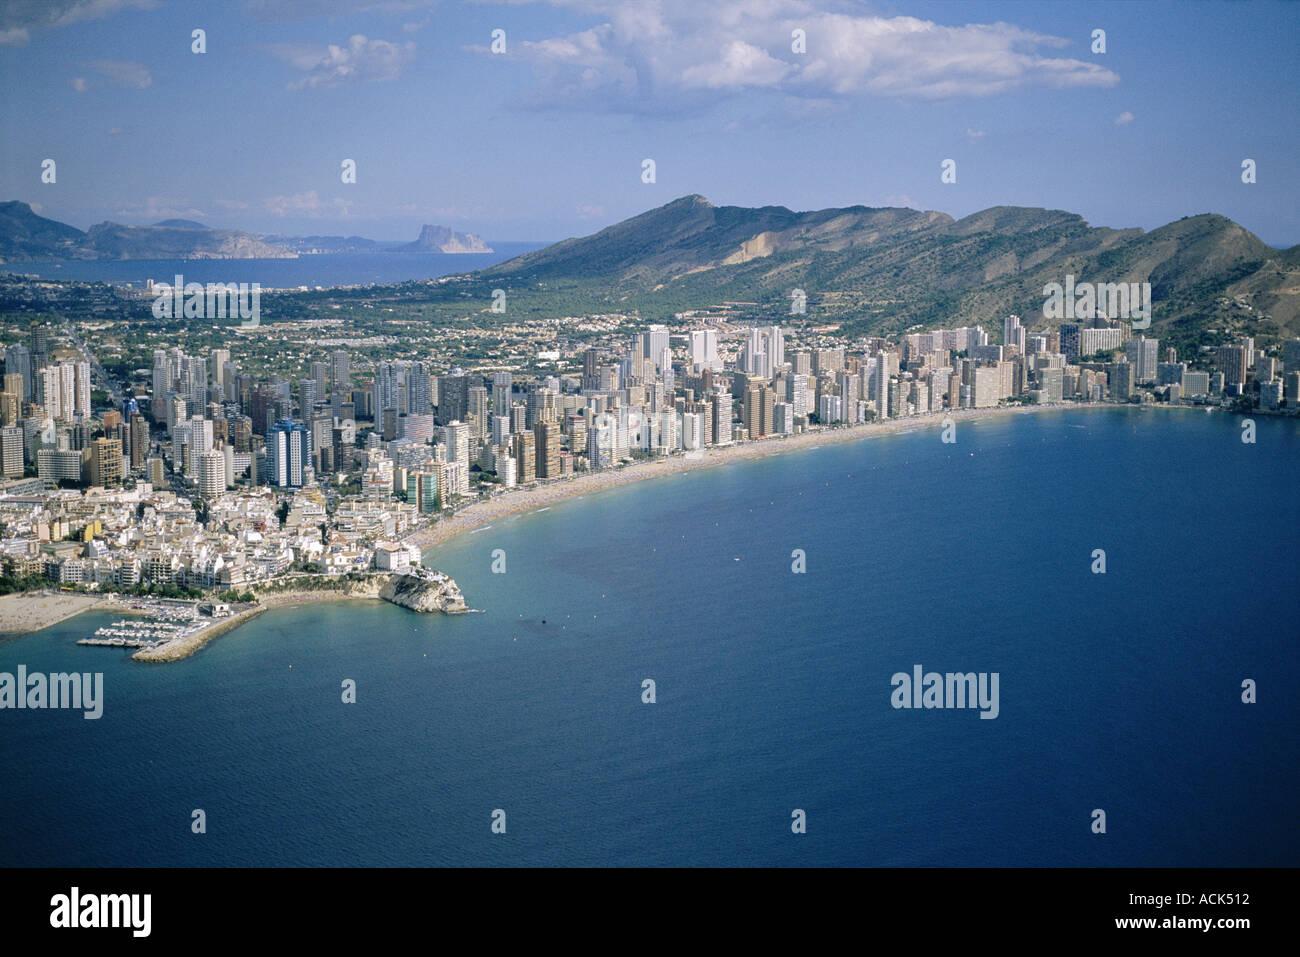 Benidorm town and beach Spain coastal development - Stock Image